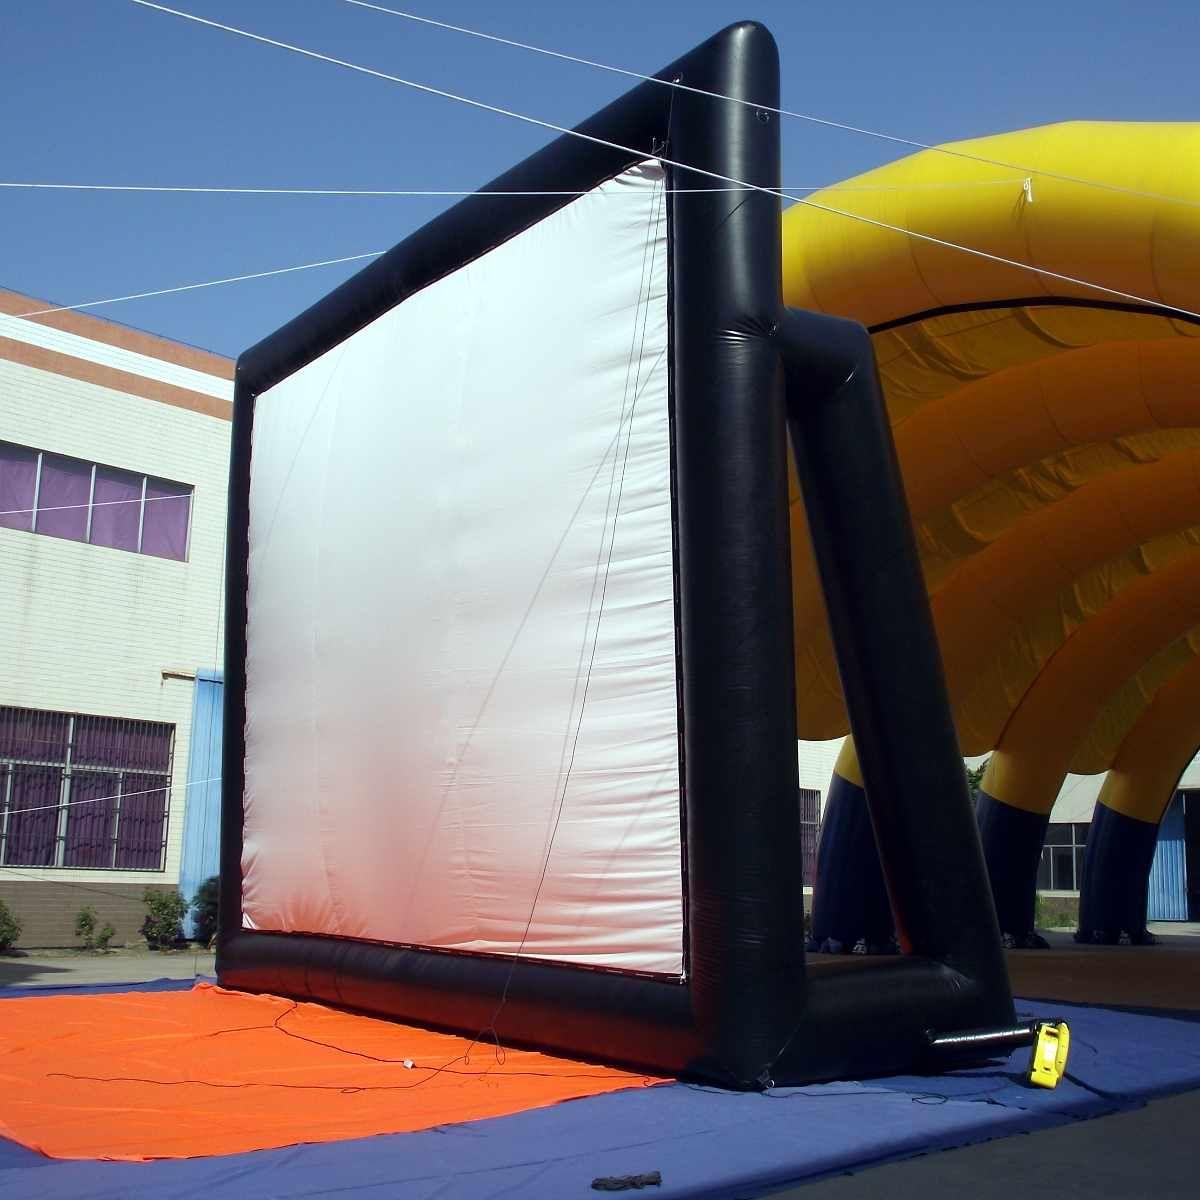 5x3m 16 9 Riesige Aufblasbare Filmleinwand Projektor Projektionsfilm Kino Theater Hinterhof 110 220 V Aufblasbare Geblase